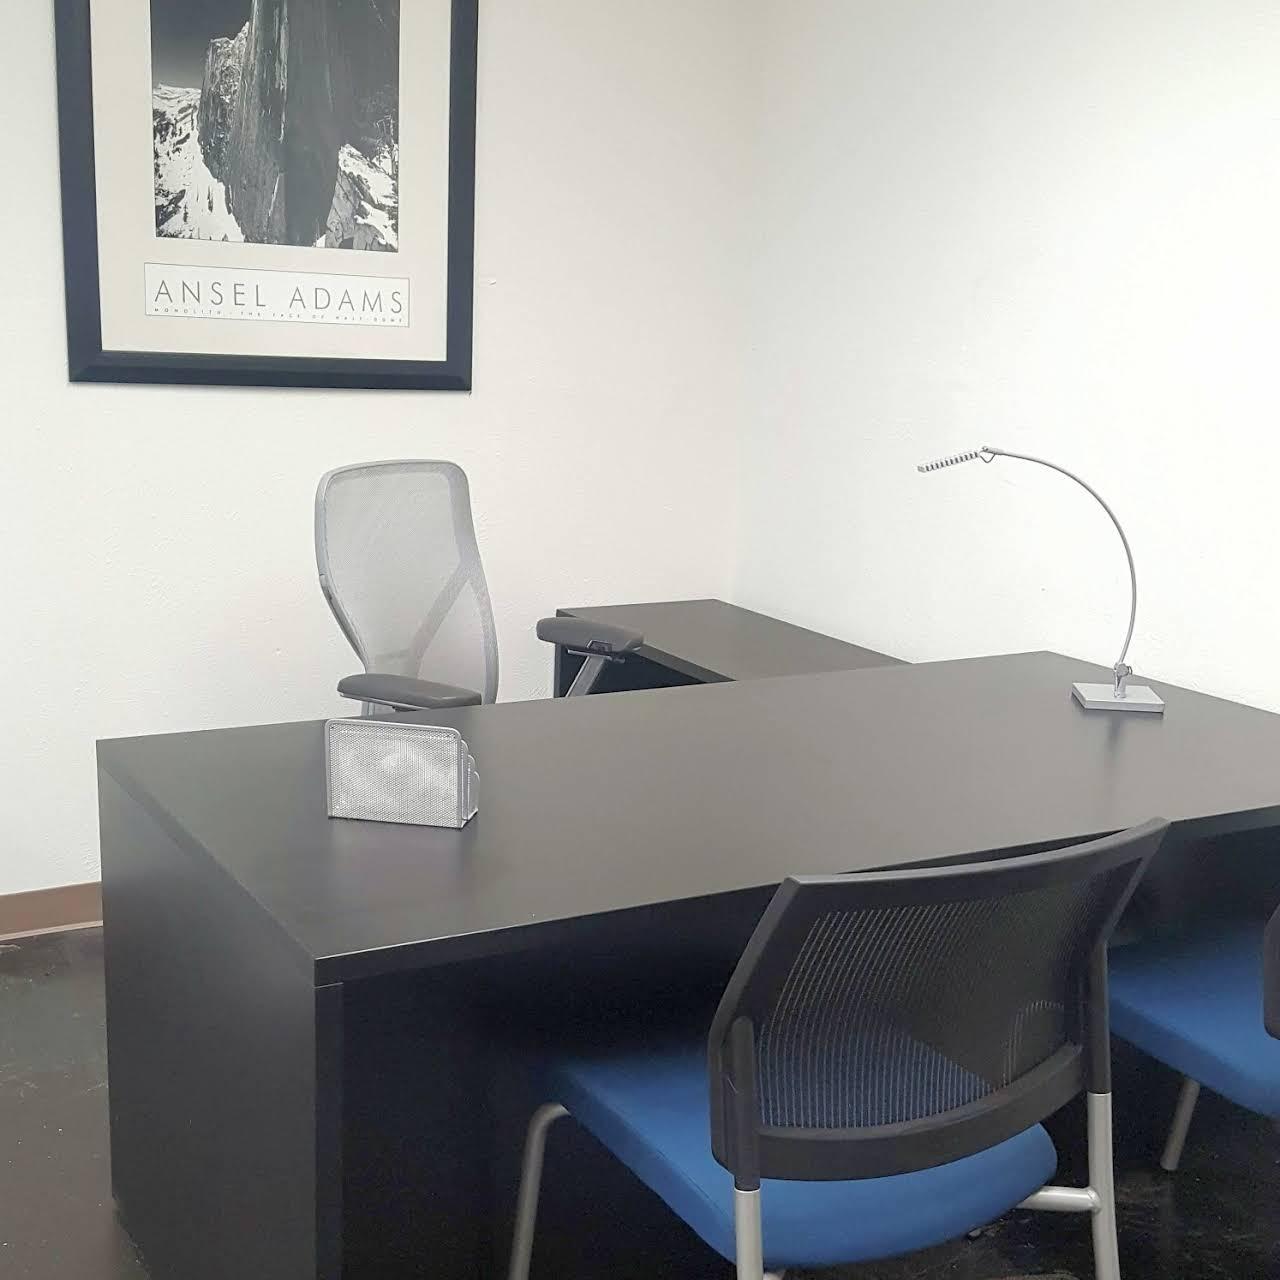 Office Furniture Idea Dallas Tx 75220 from lh3.googleusercontent.com